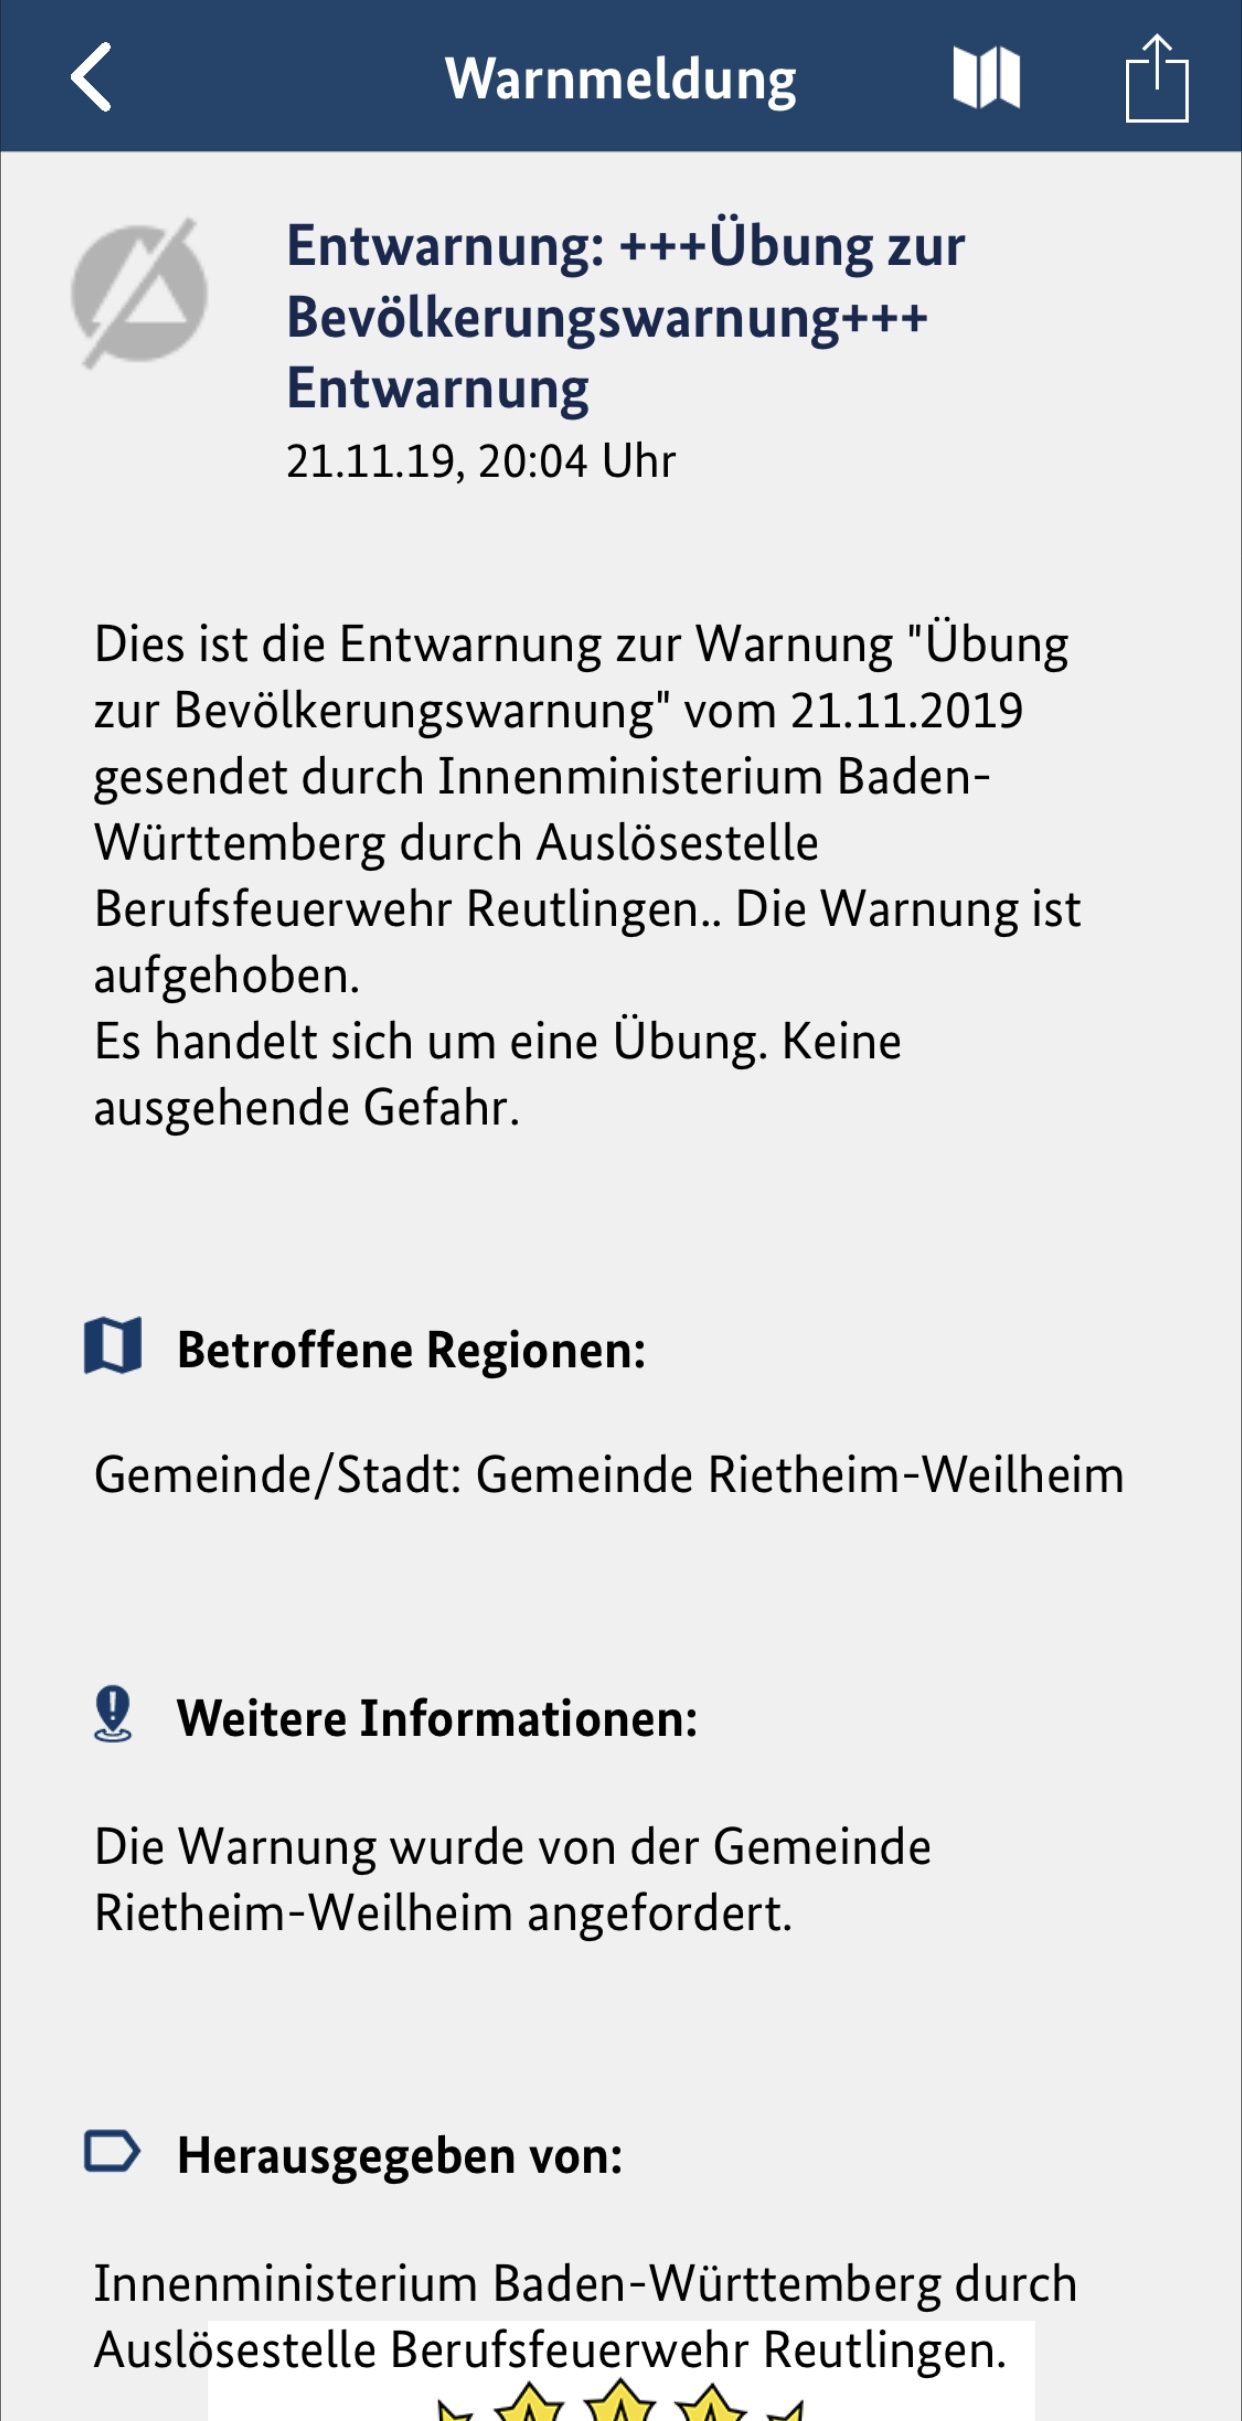 "Entwarnungsmeldung der Warn-App ""NINA"""